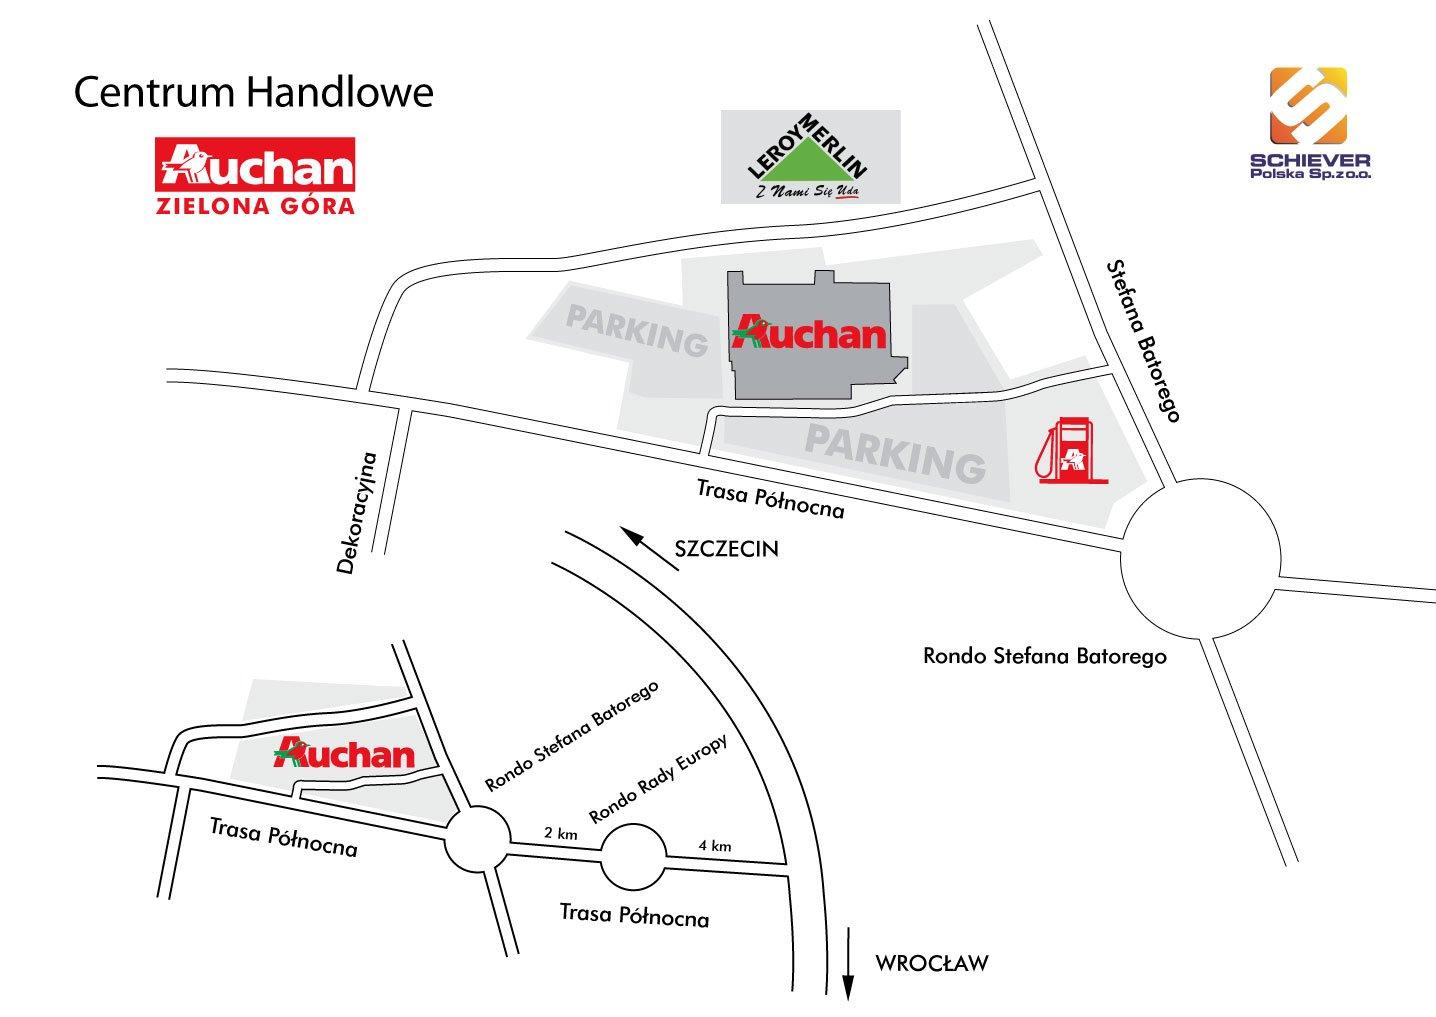 e6bdb7f2d561 Galeria handlowa - Auchan - Zielona Góra - Schiever Polska